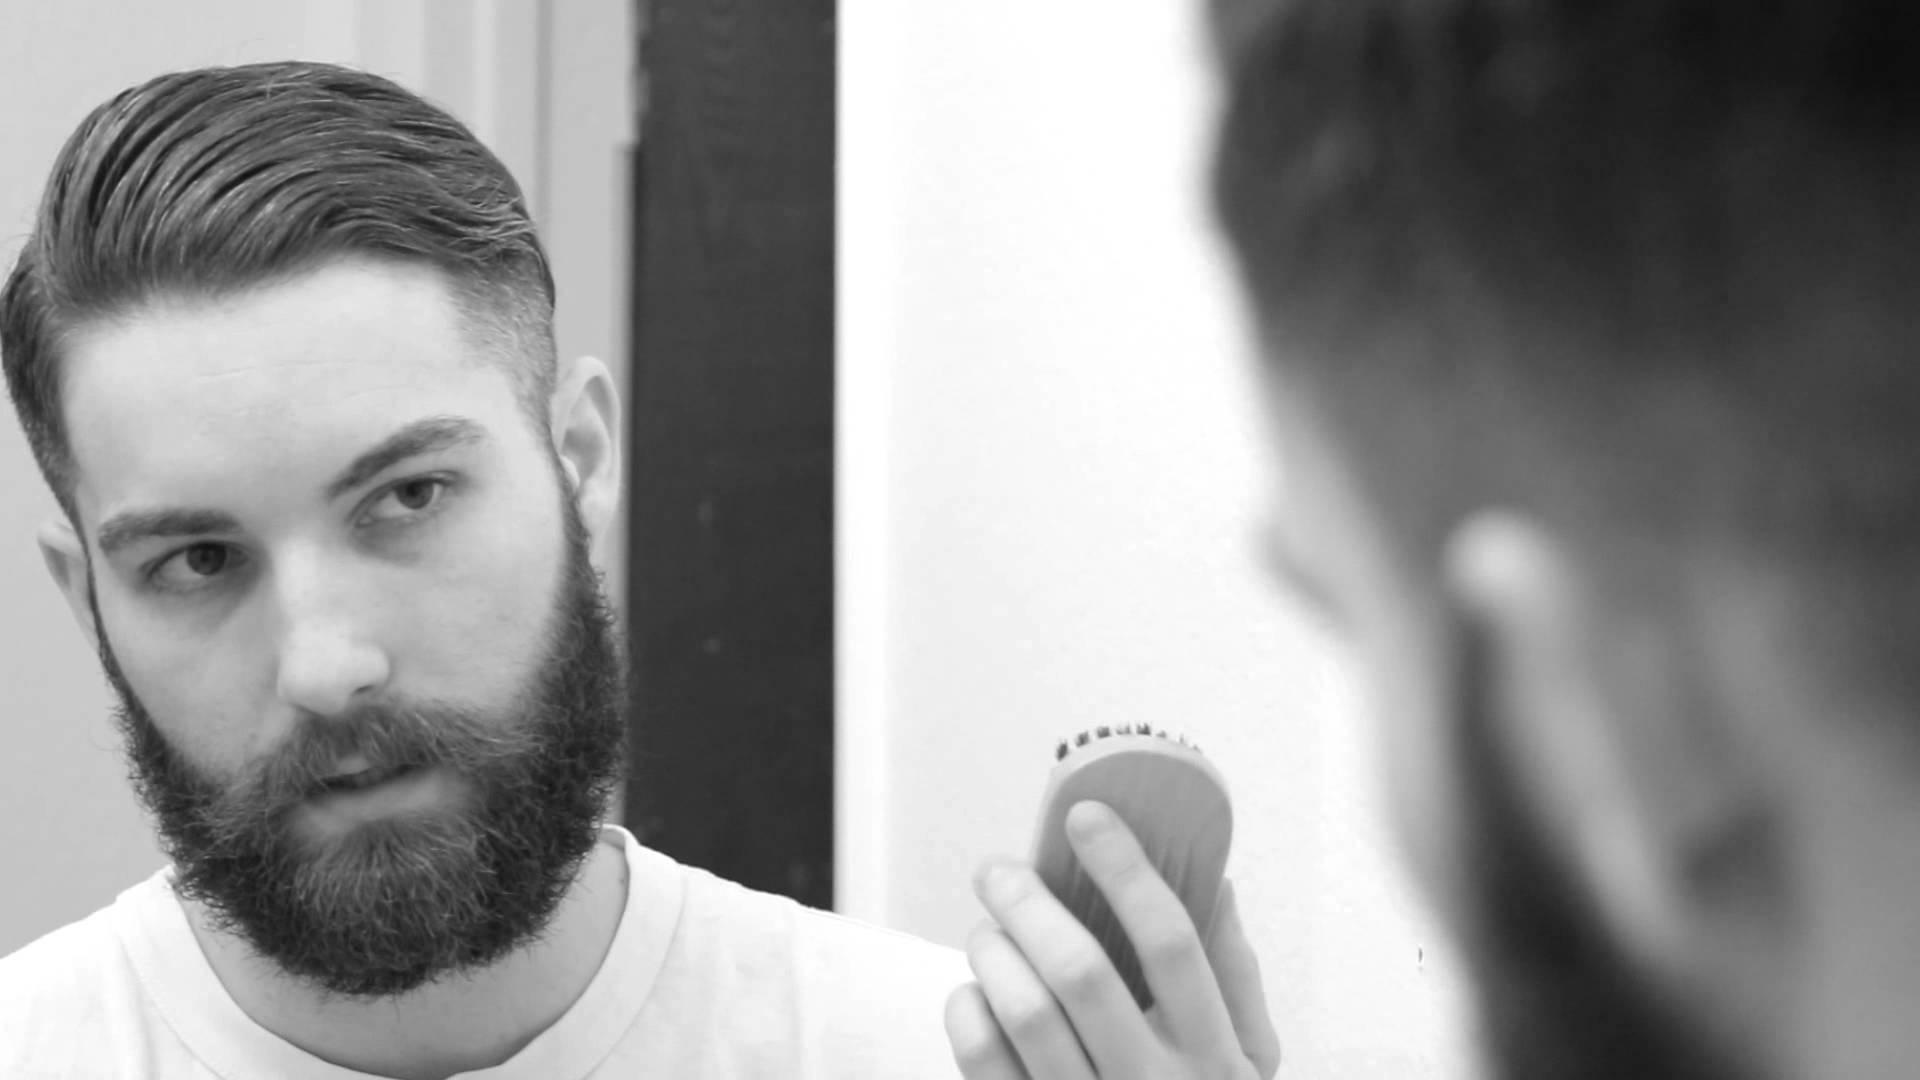 Beard Growth : Benefits Of Castor Oil & How To Apply Castor Oil